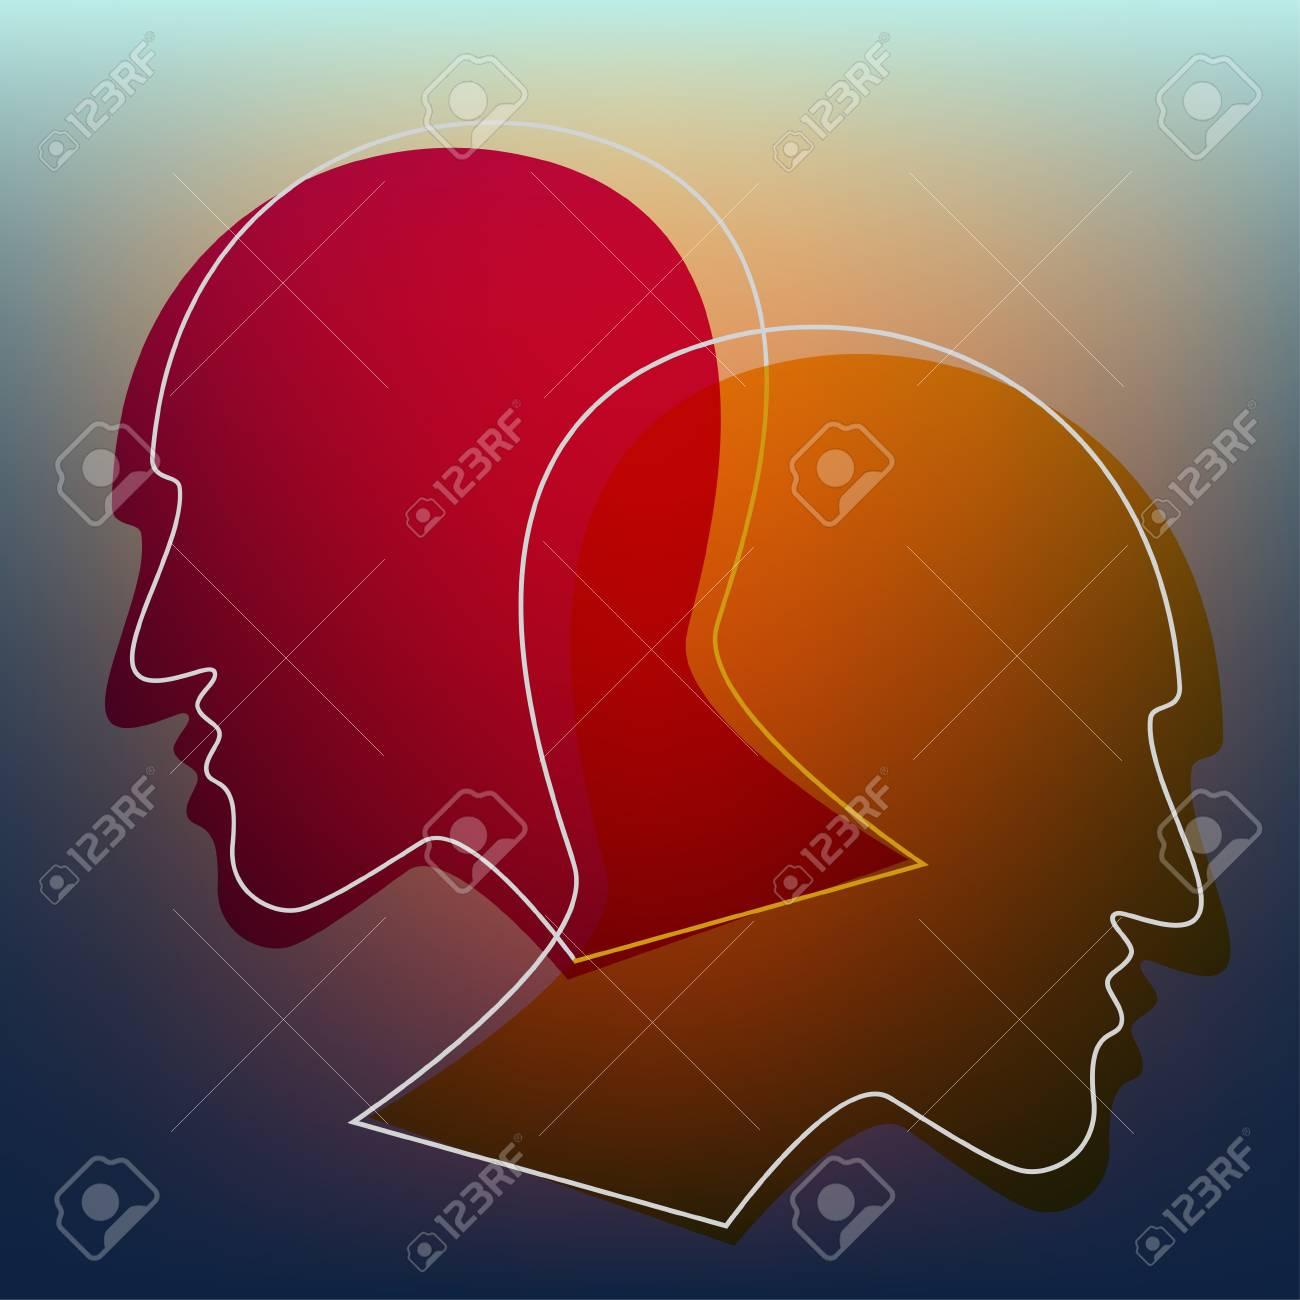 Schizophrenia Concept Symbol Of Depression Dementia Vector